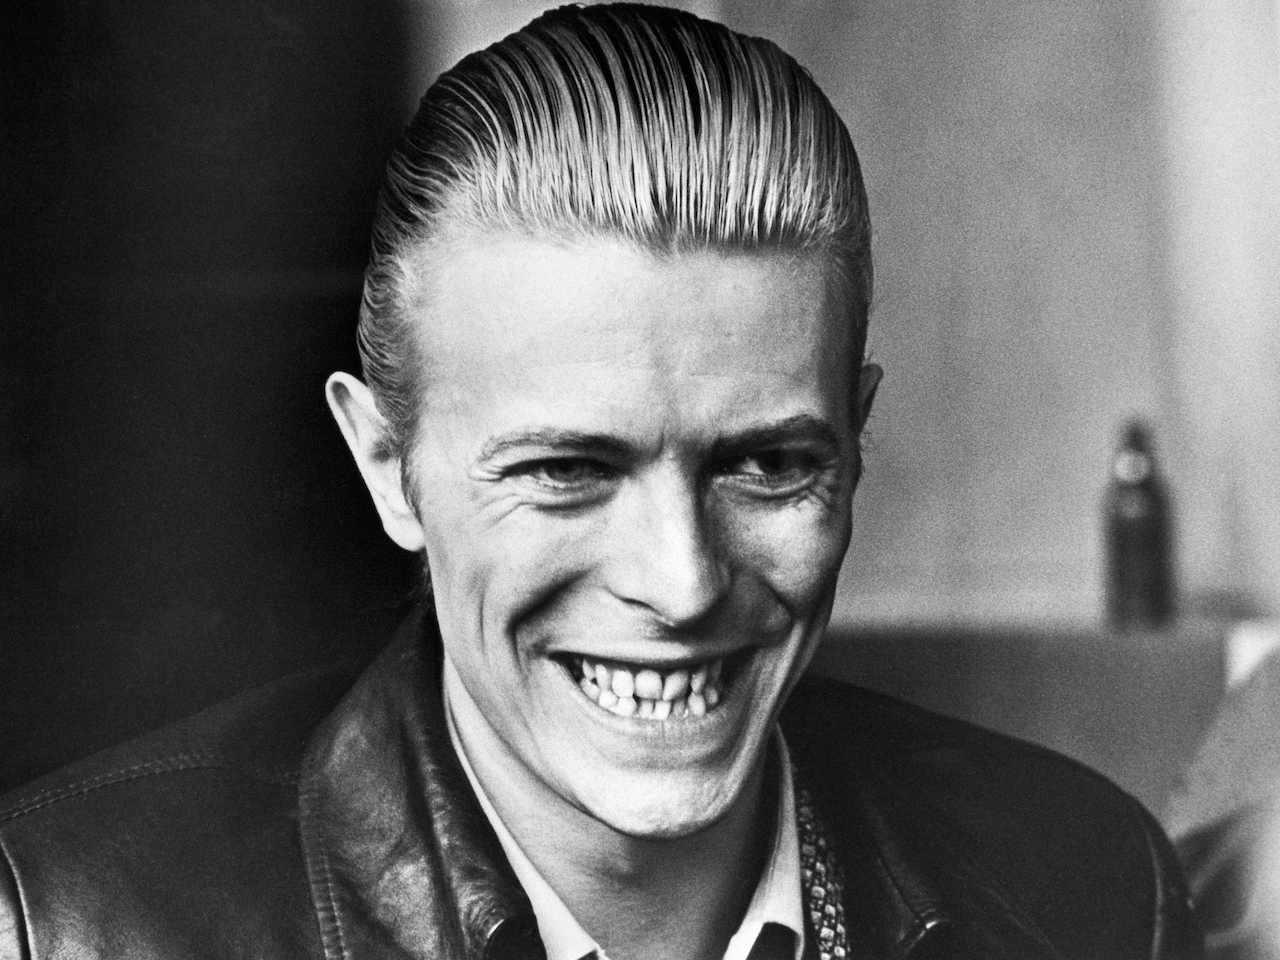 April 1, 1976, British singer David Bowie is pictured, in April 1976, in Helsinki.